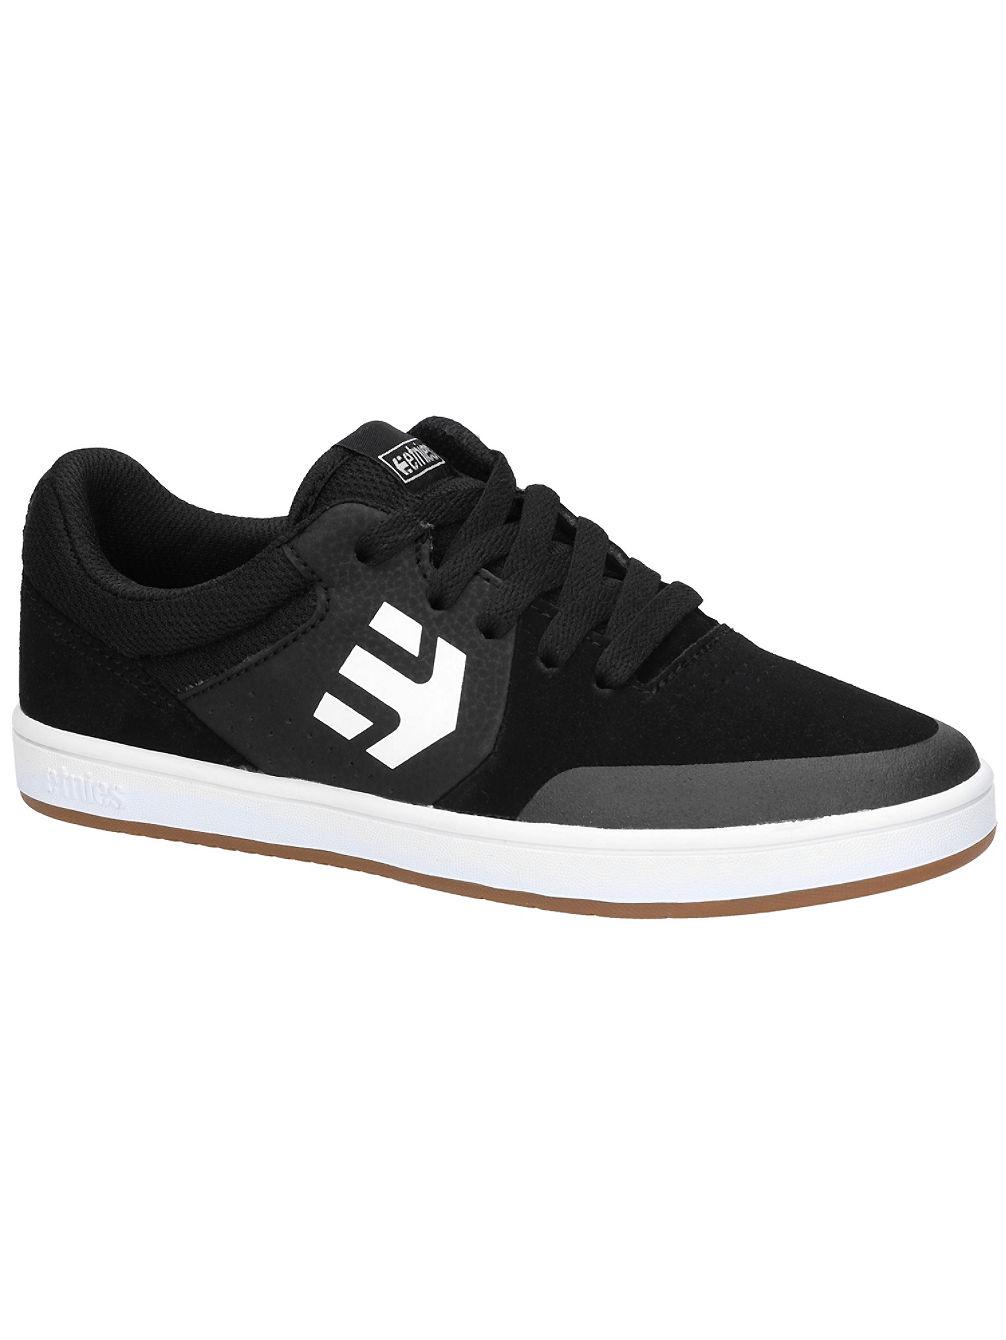 Buy Etnies Marana Skate Shoes online at blue-tomato.com abe8e3bf1